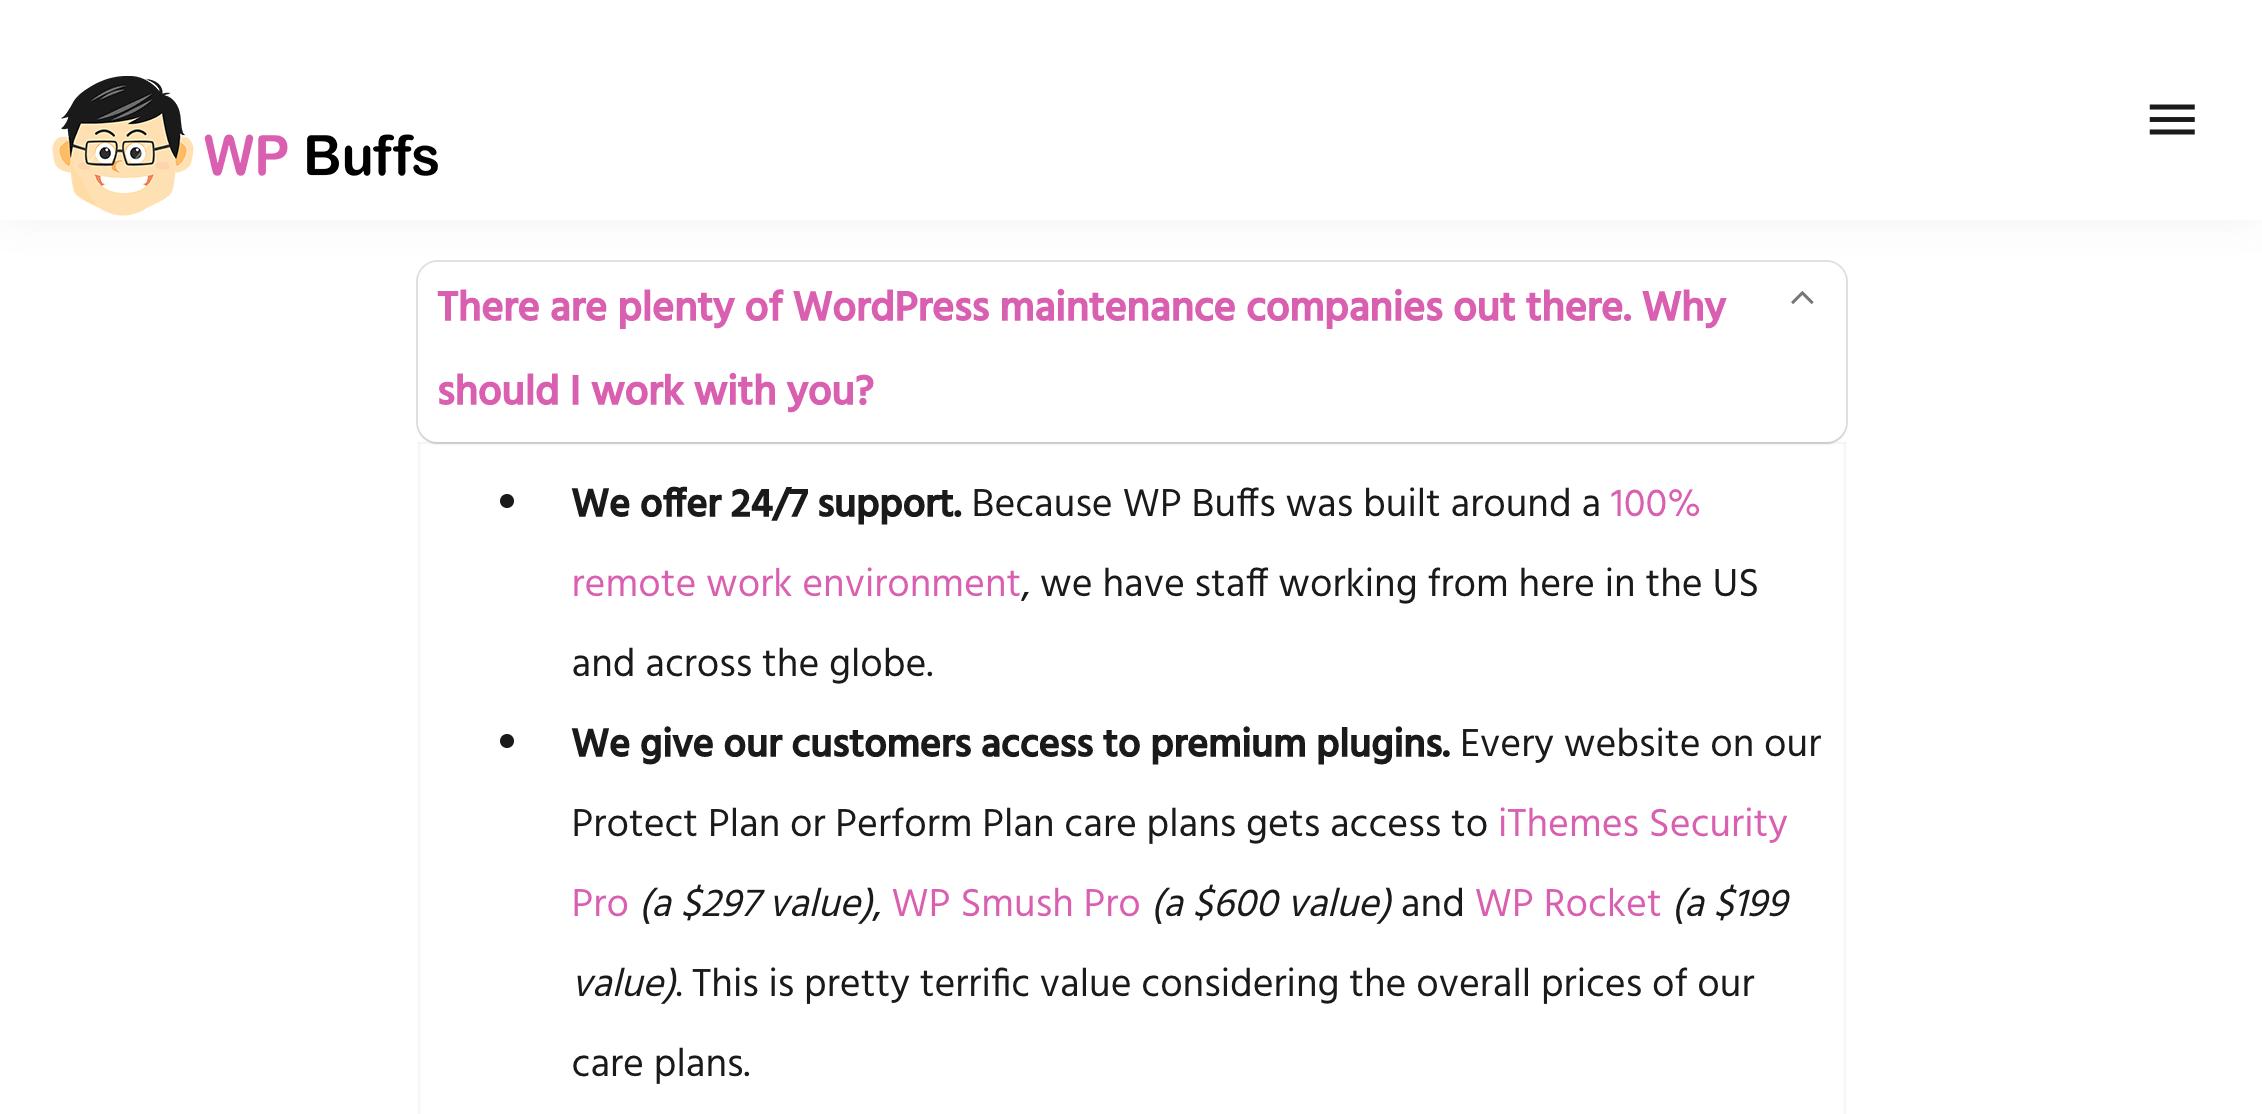 WordPress care plans.